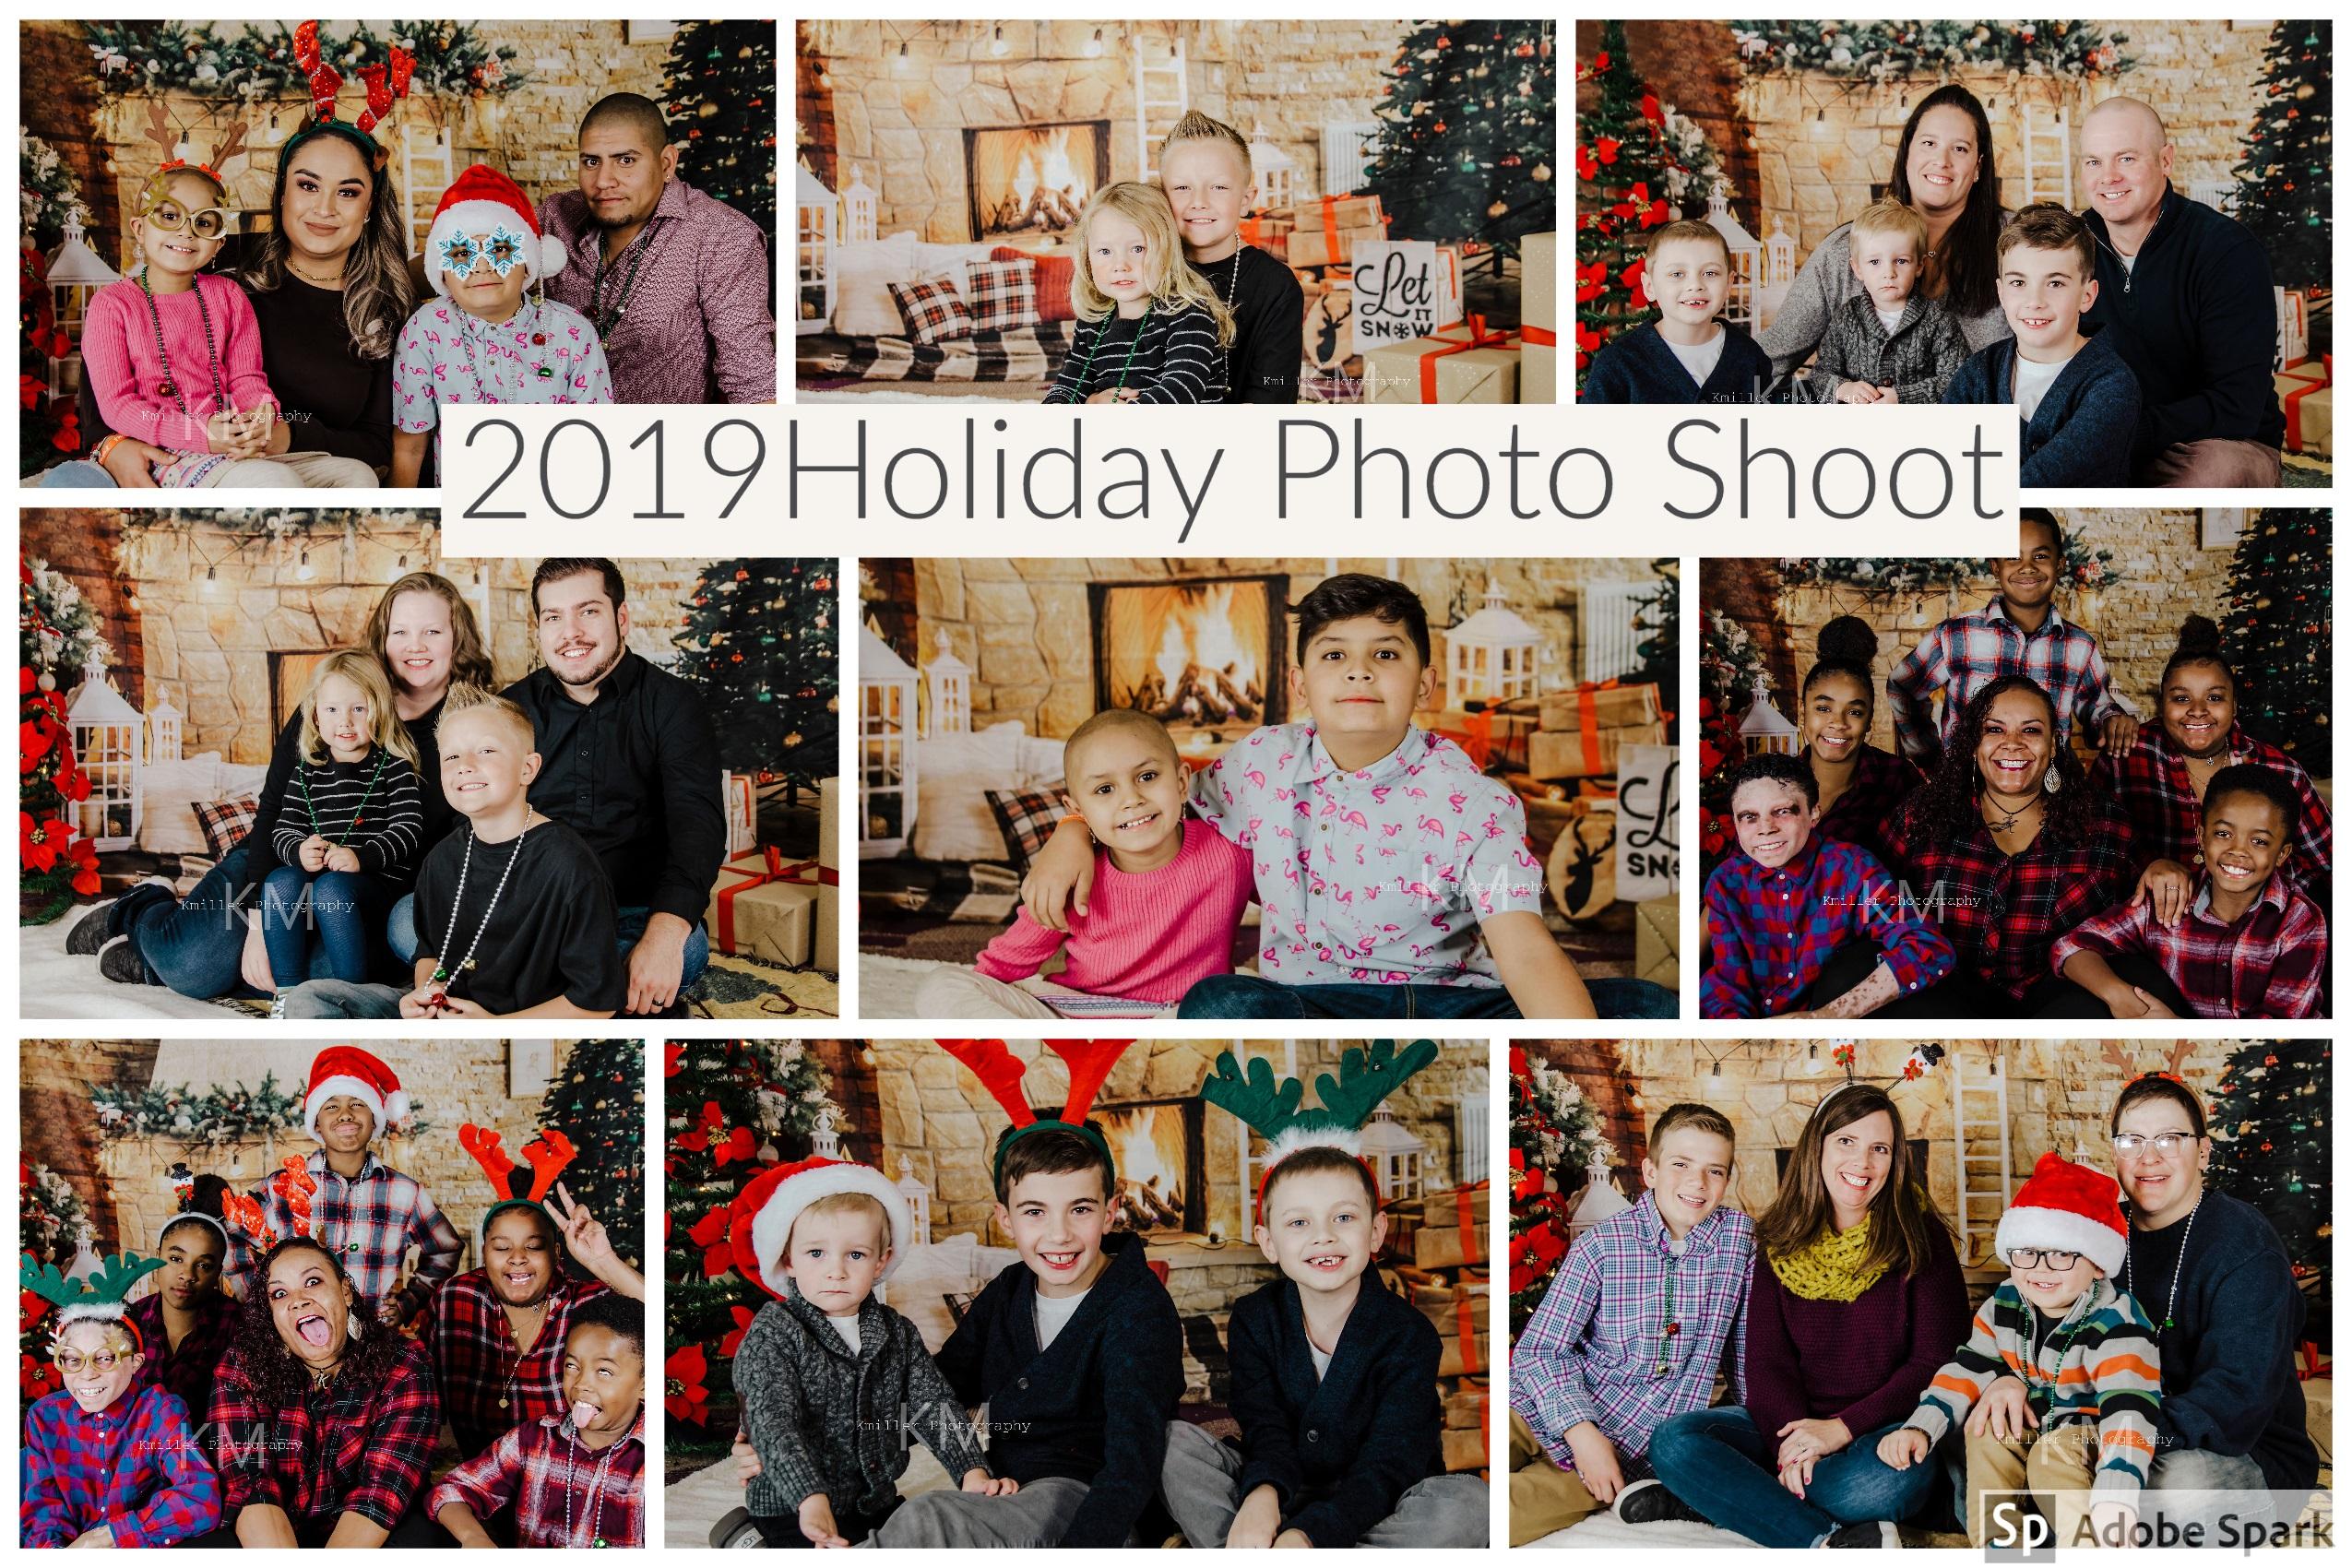 2019 holiday photo shoot